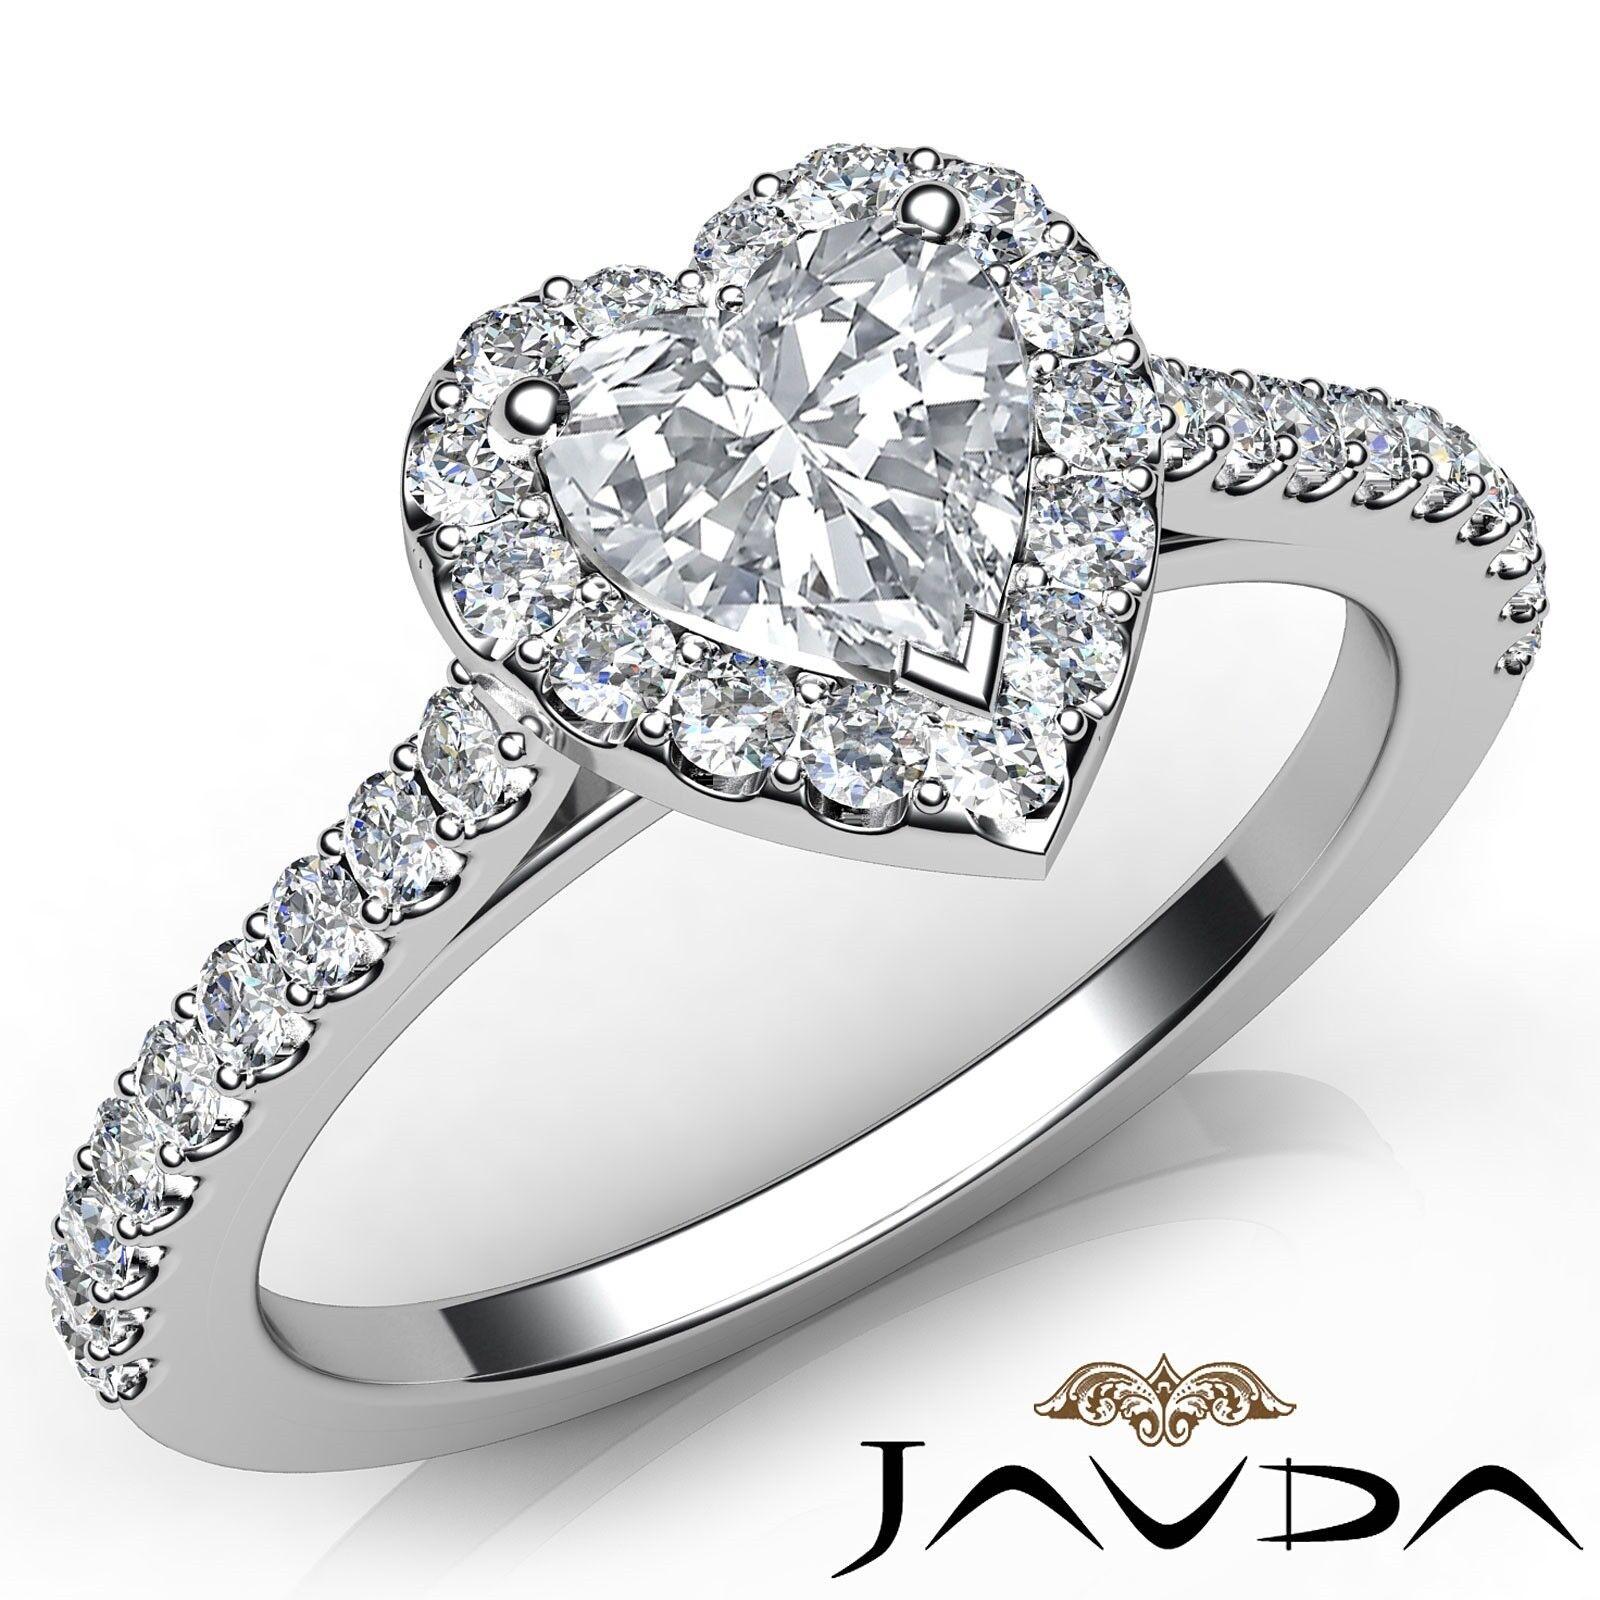 1.04ctw Circa Halo Heart Diamond Engagement Ring GIA F-VS1 White Gold Women New